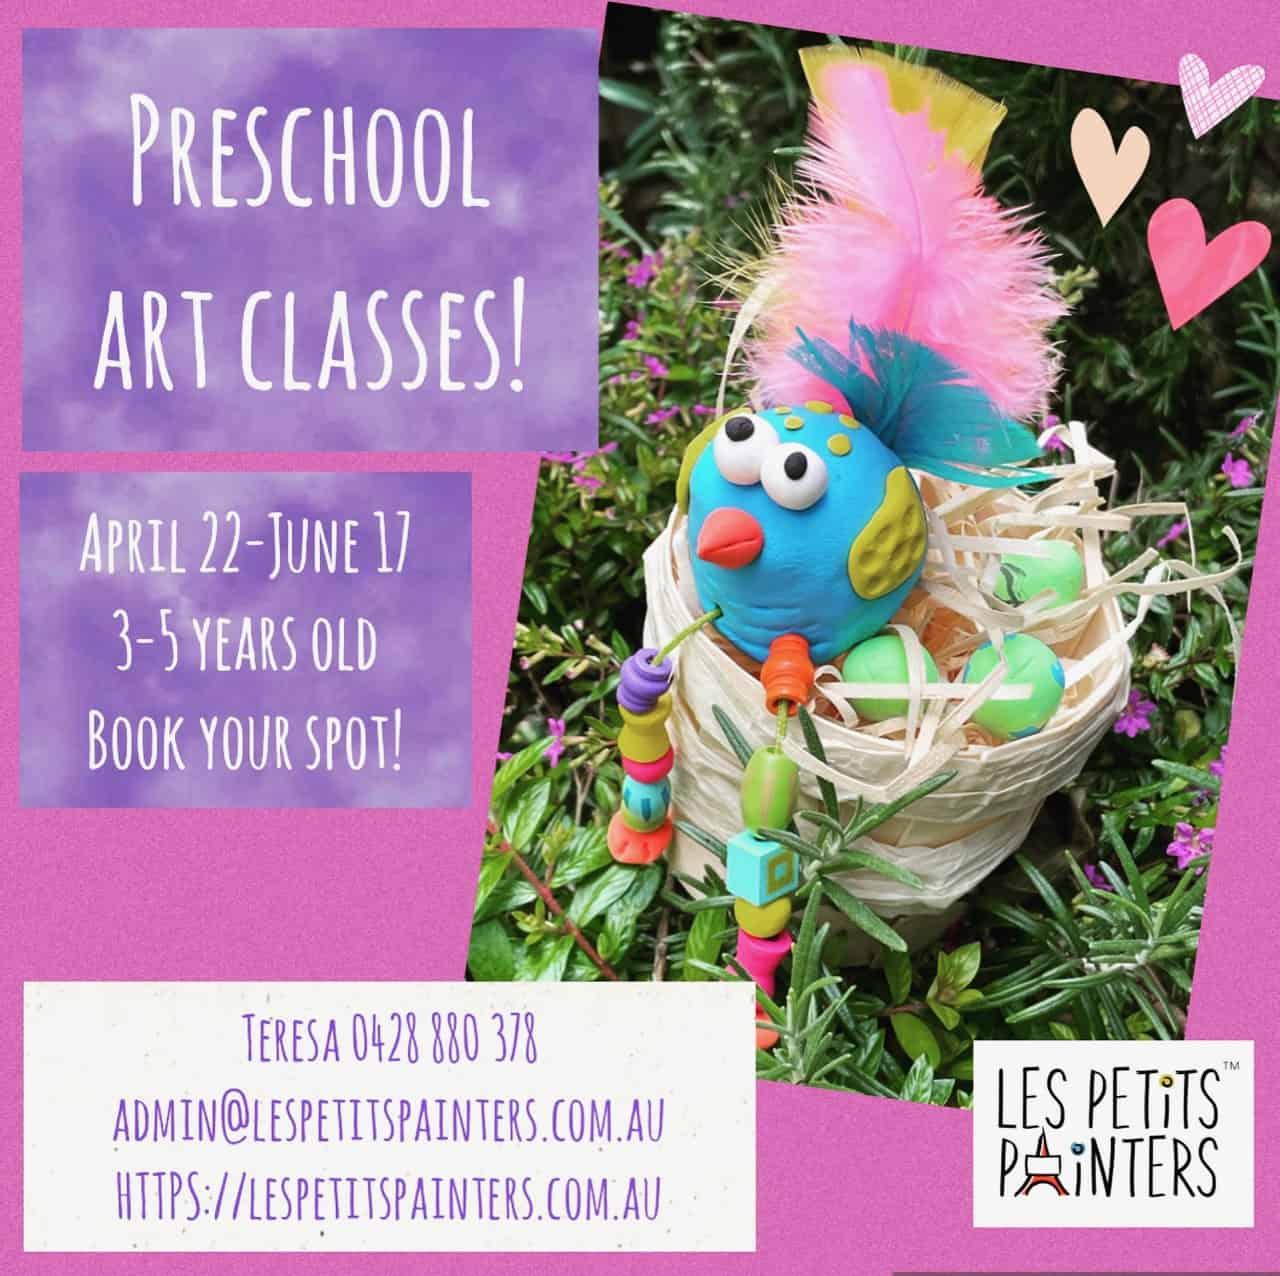 Art classes for children, Arts and crafts classes for preschool kids, Les Petits Painters fun art classes for kids